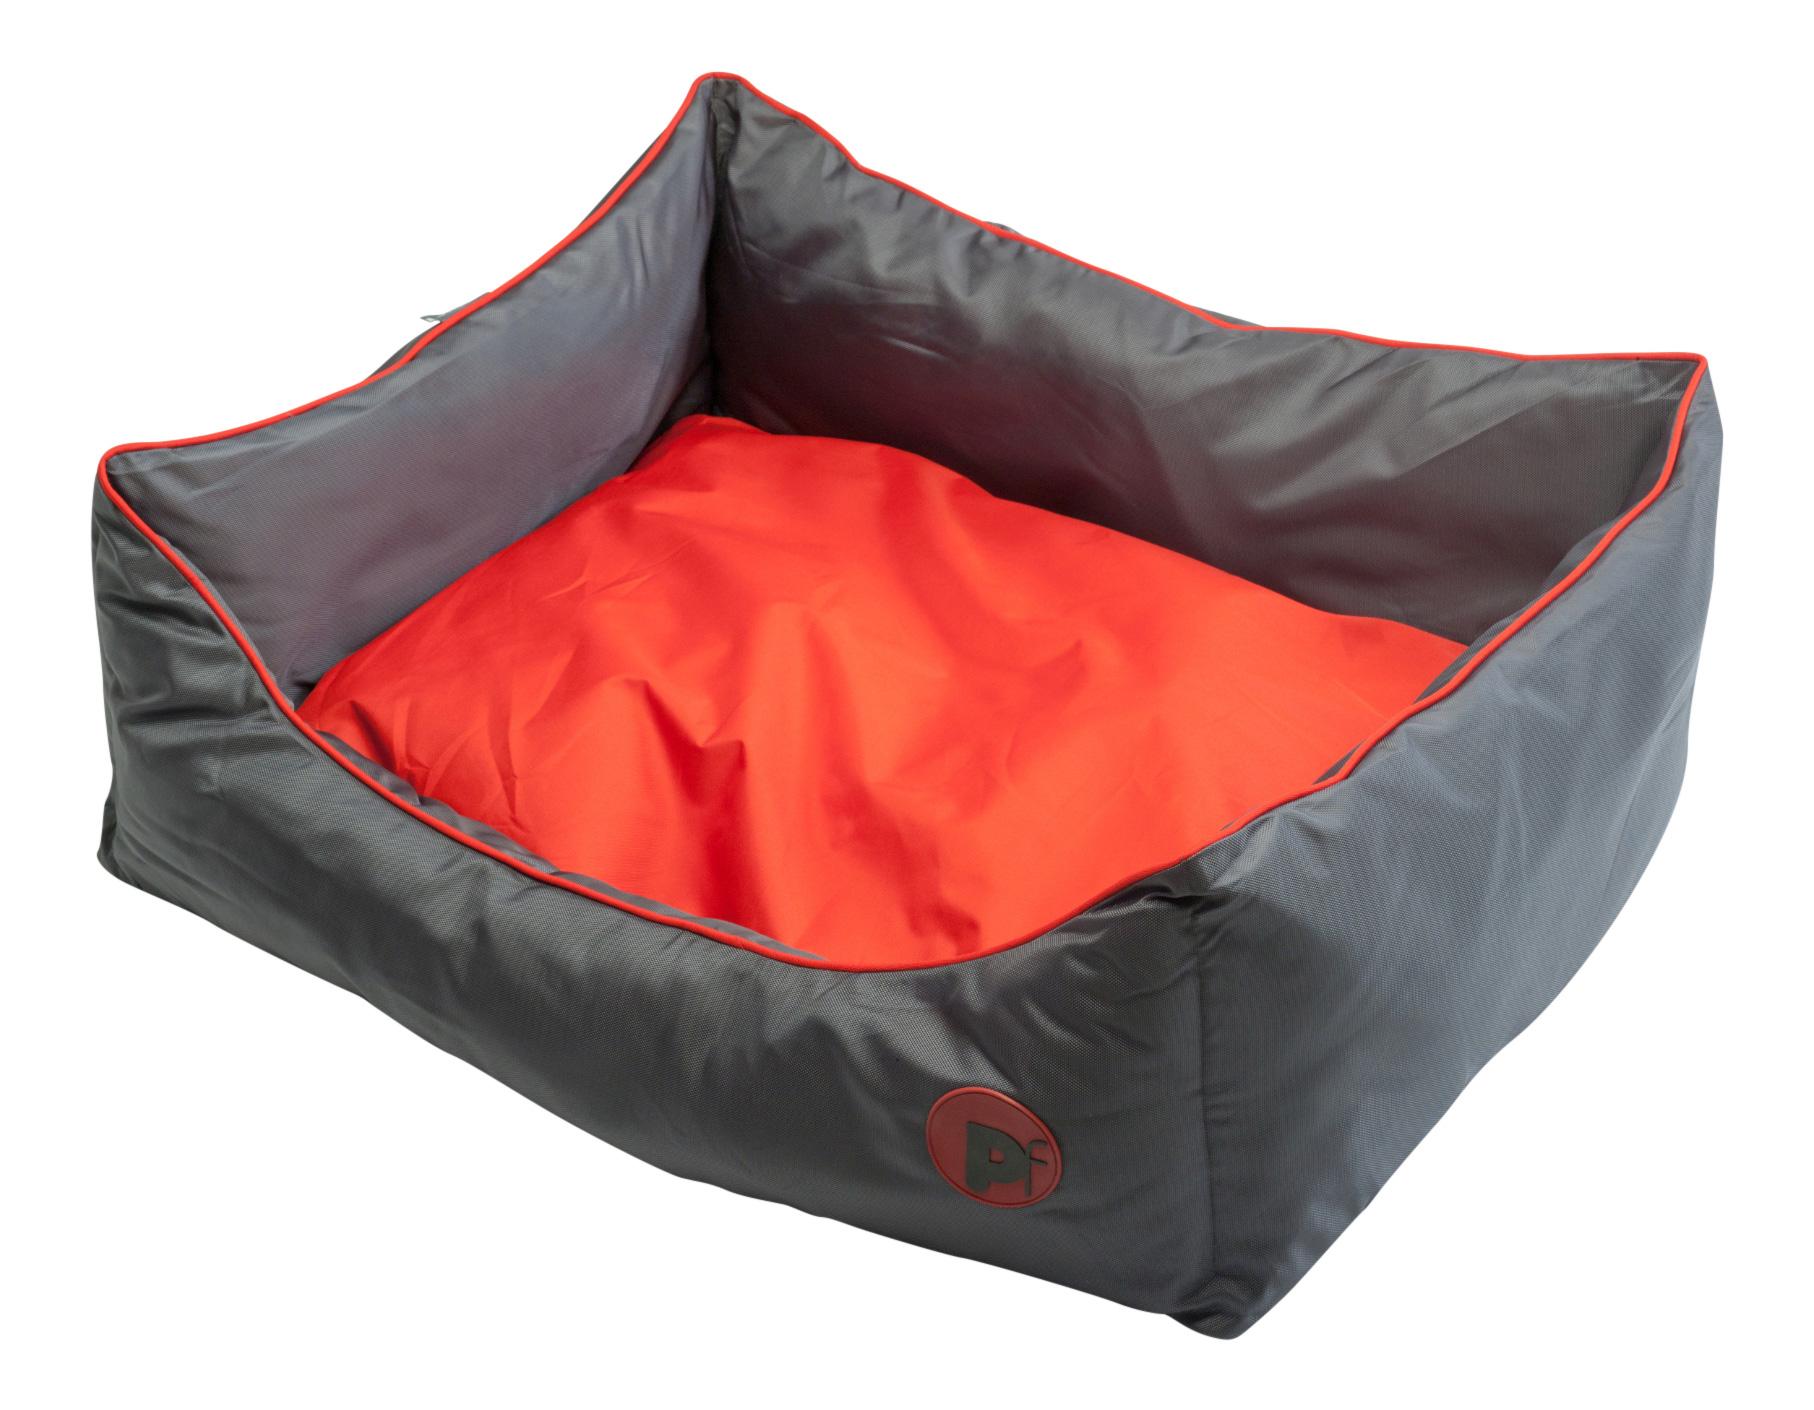 Petface Xxl Dog Bed